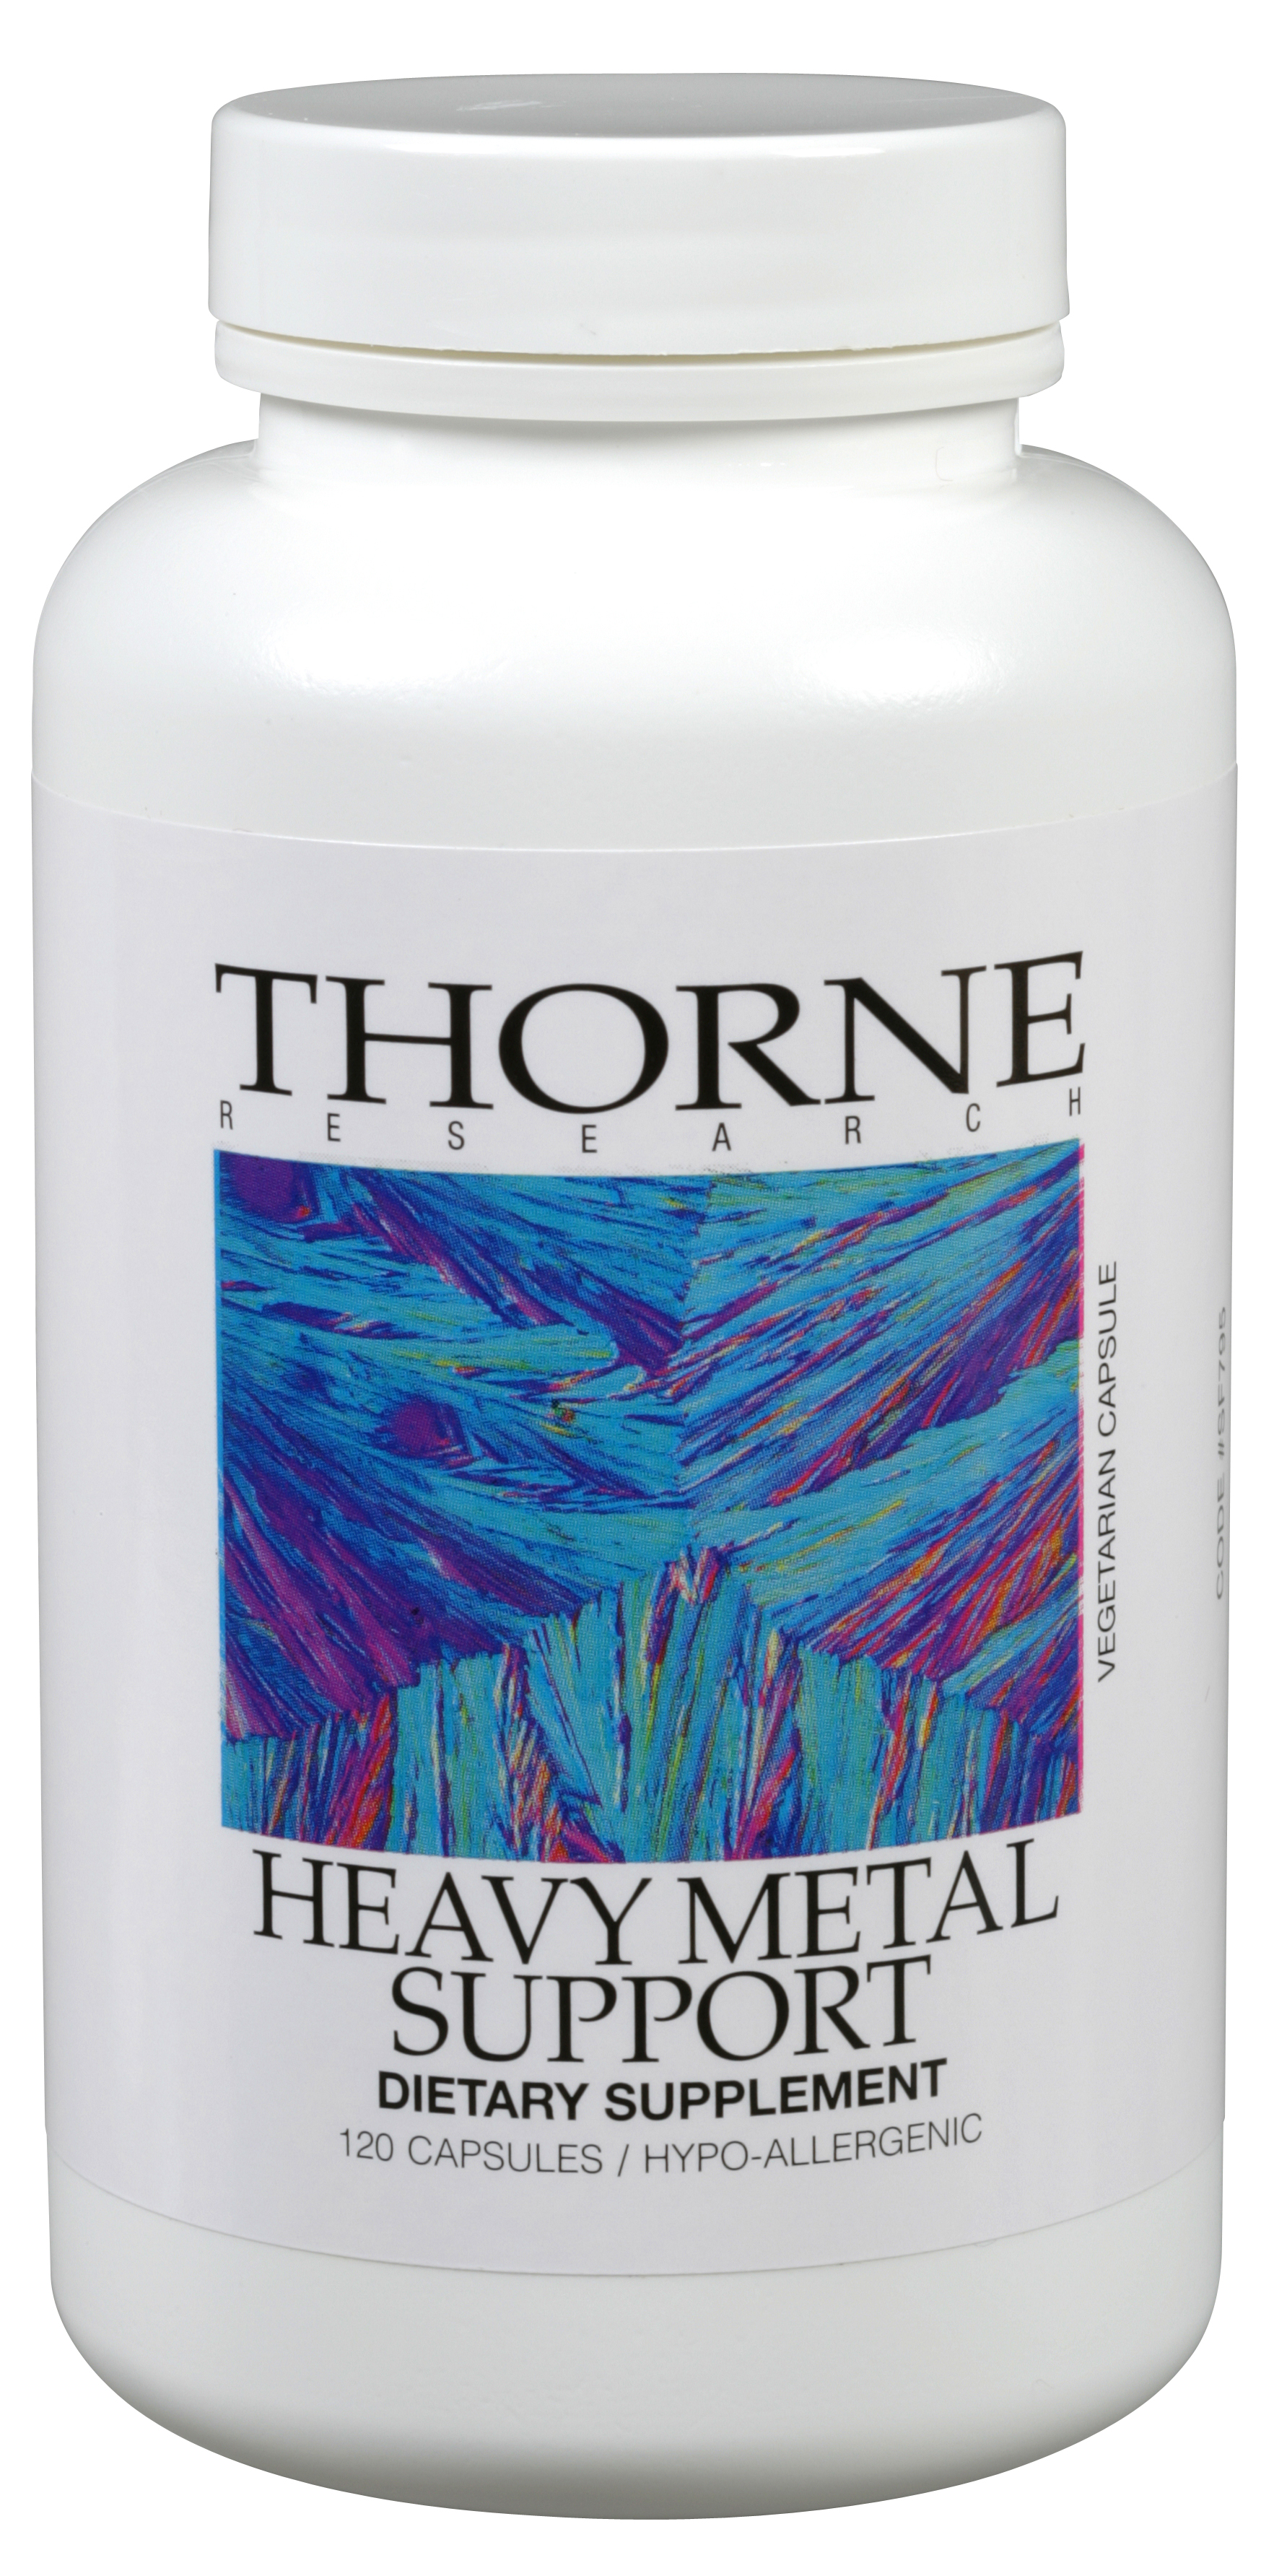 heavy-metal-support-120-capsules-sf795.jpg